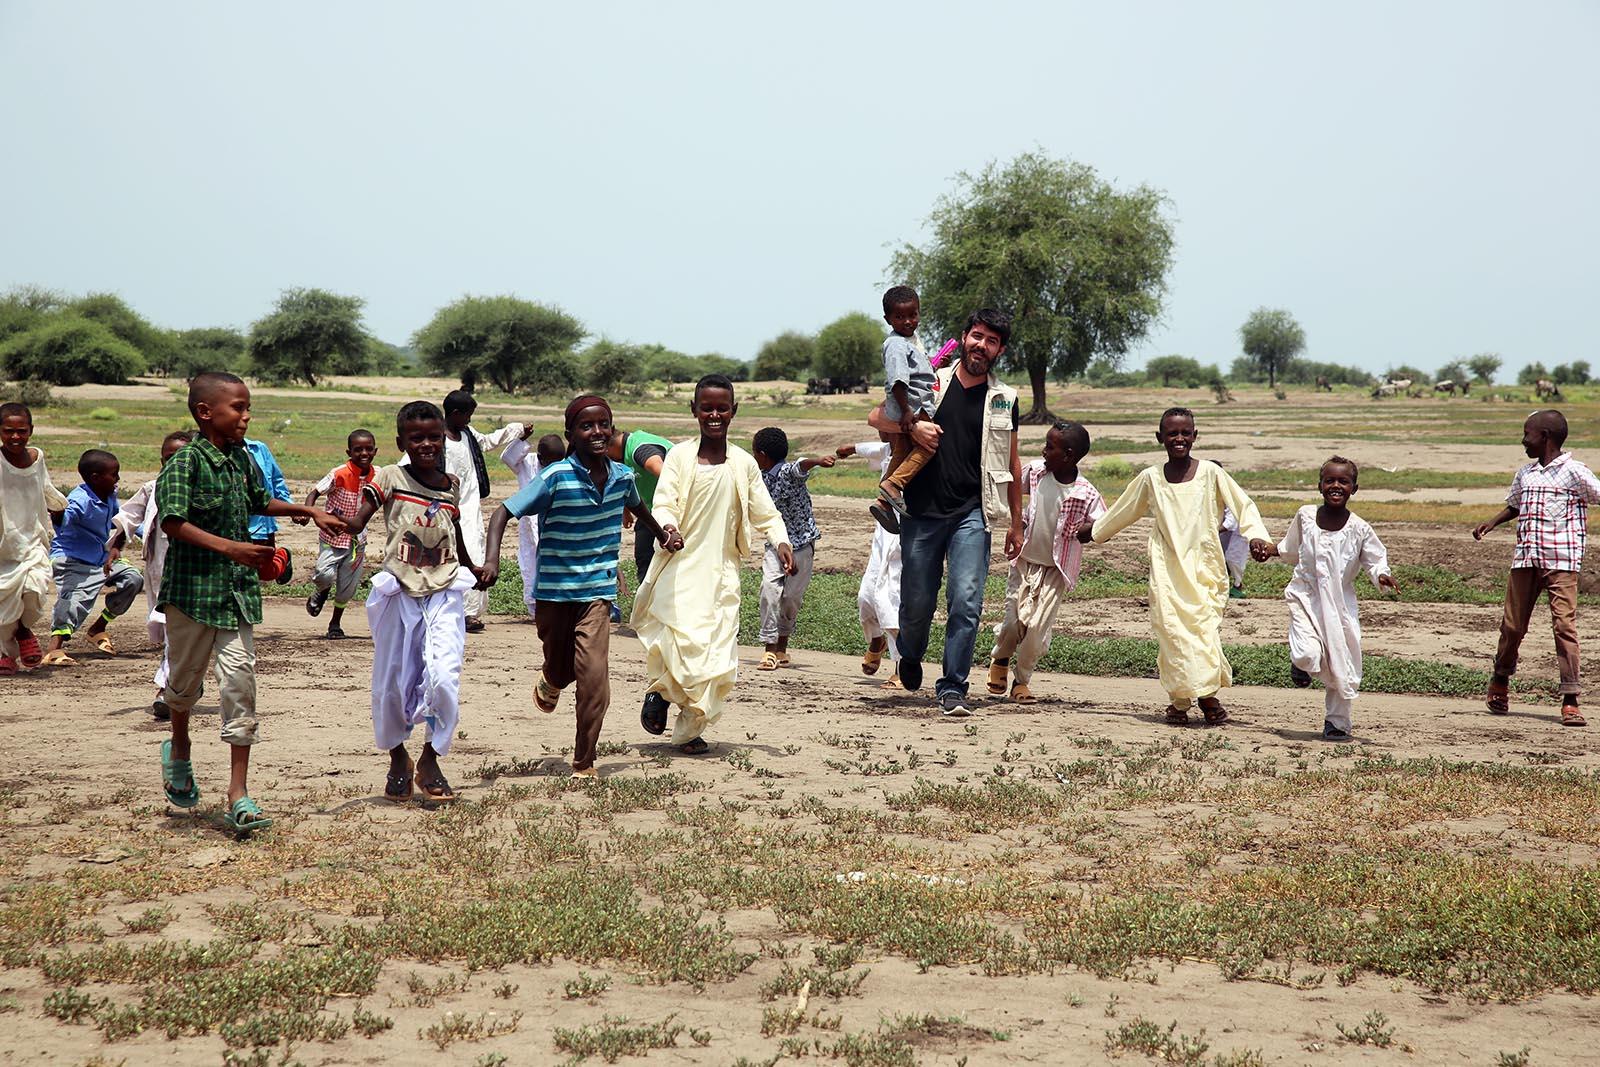 sudan-eglence-programi.jpg